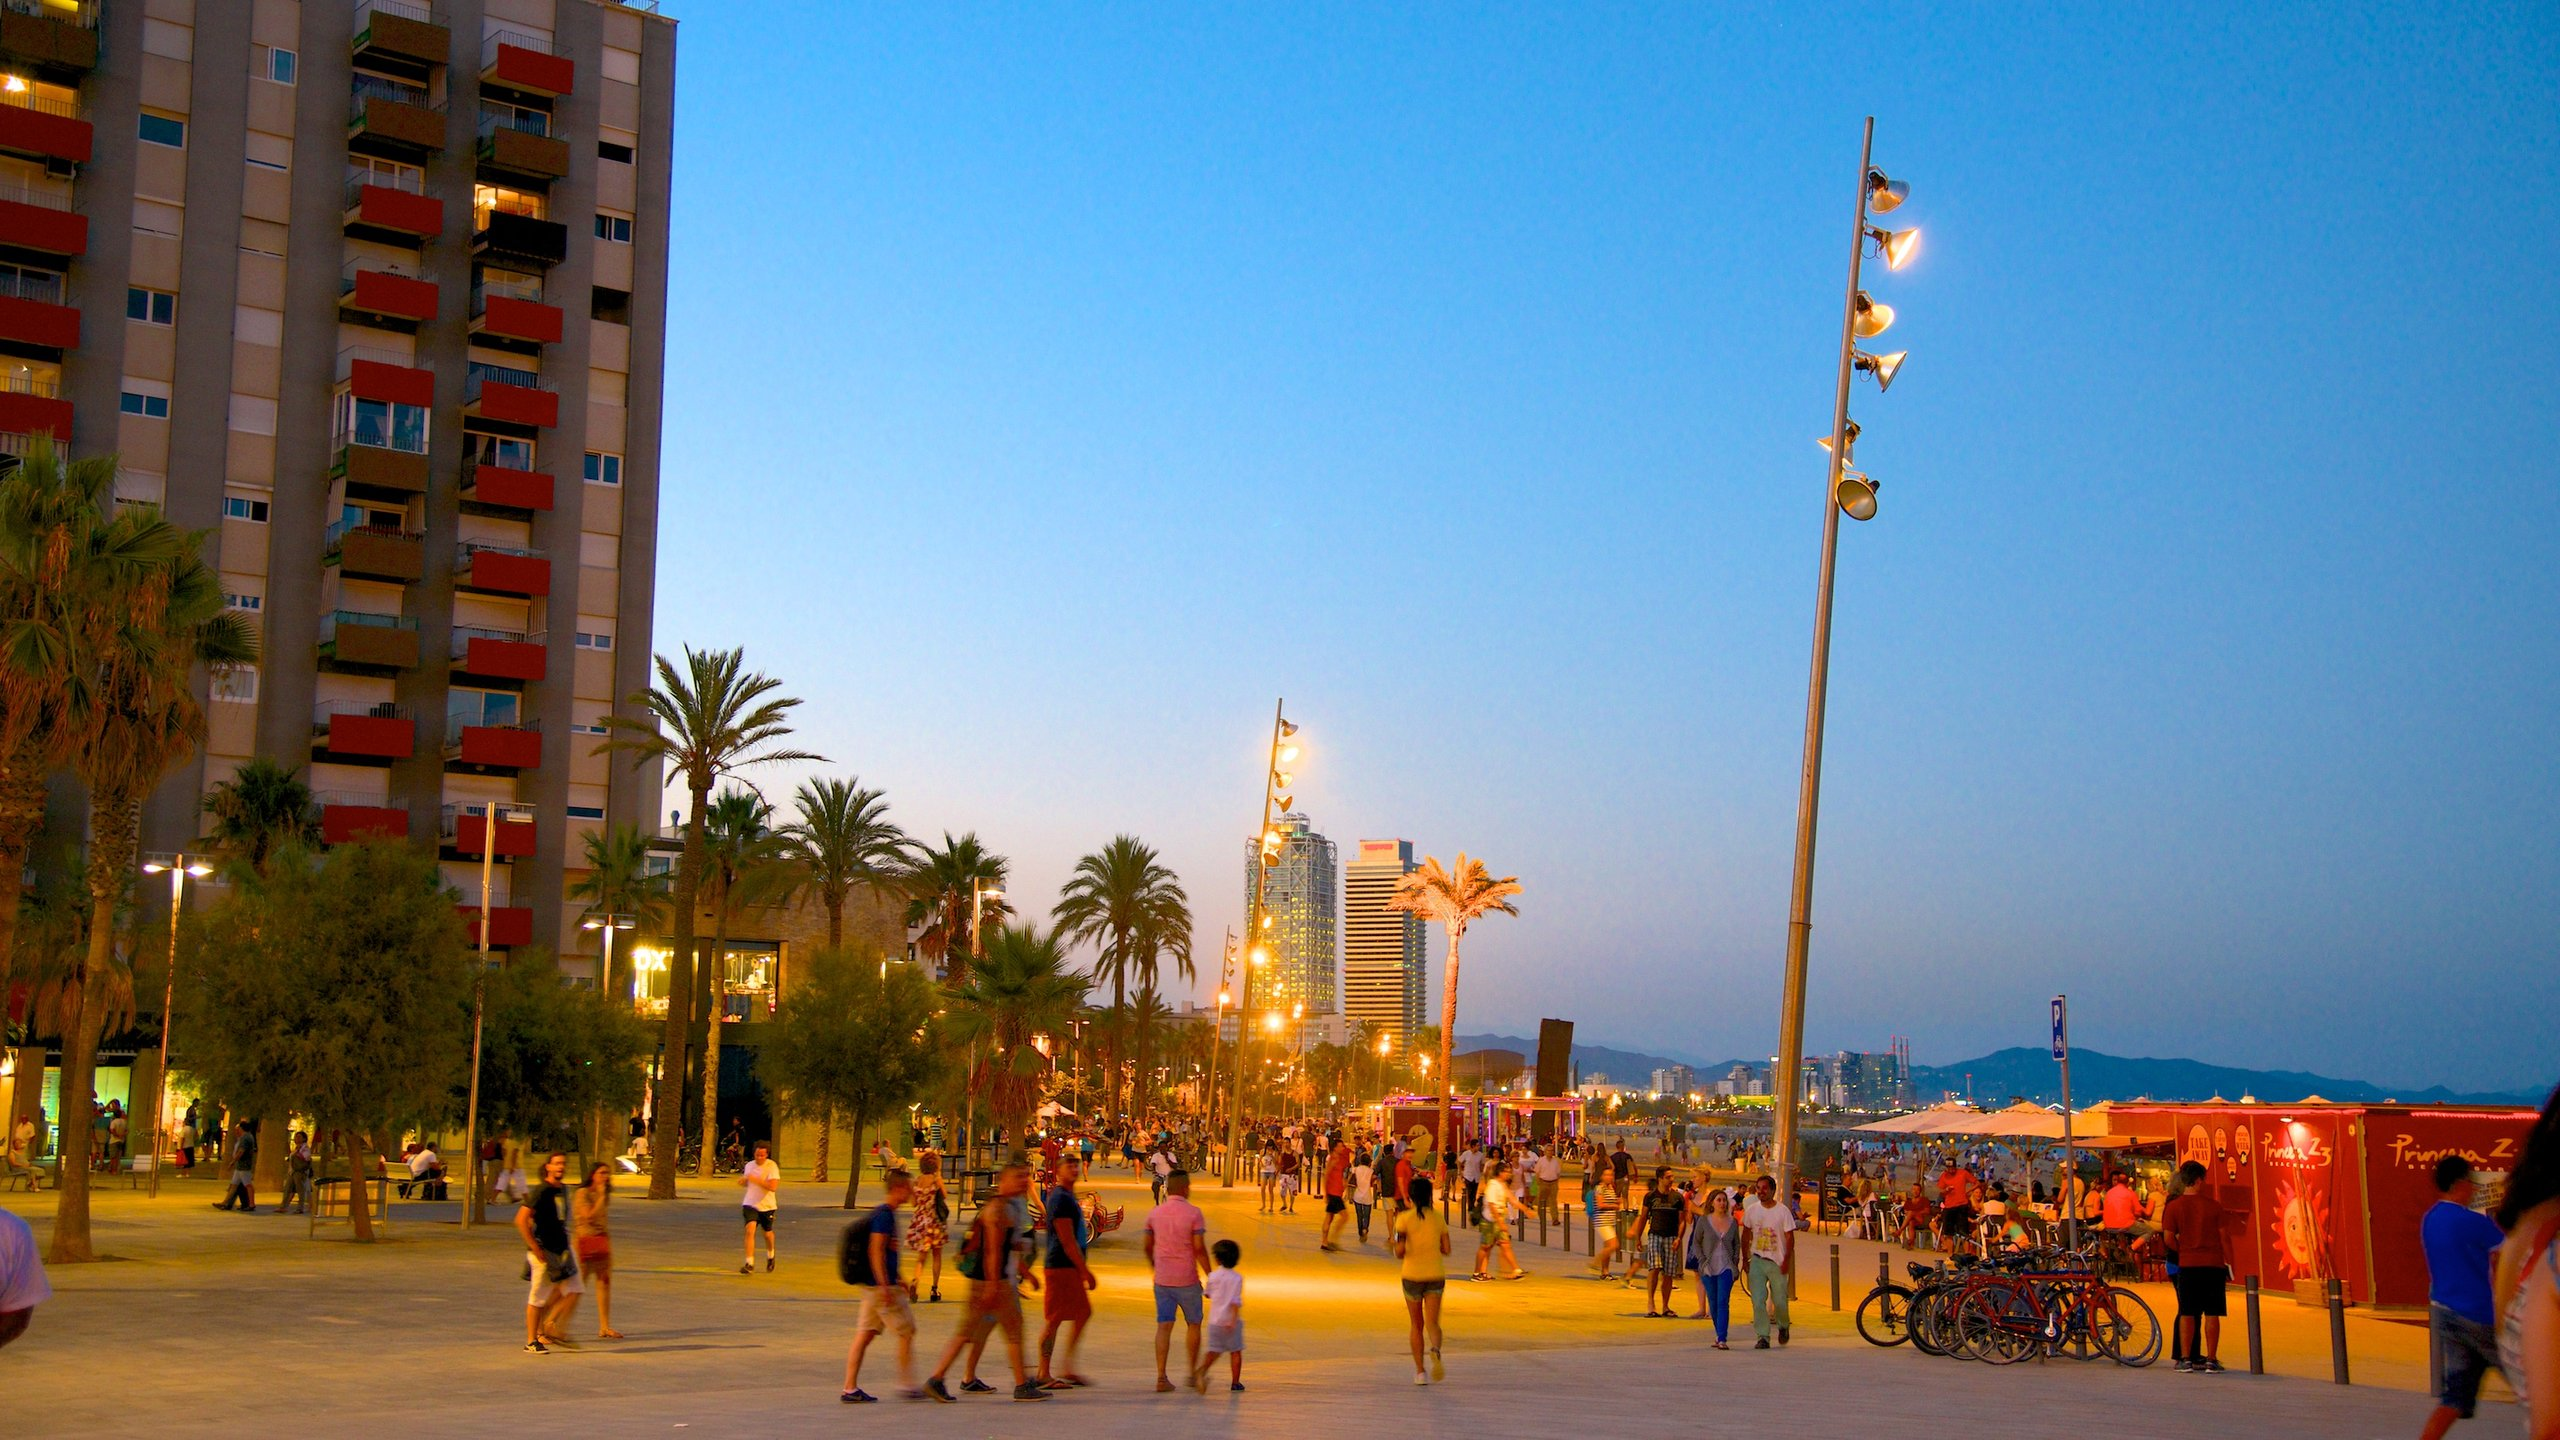 Hotel Barcelona Gunstig Buchen Hotels Expedia De